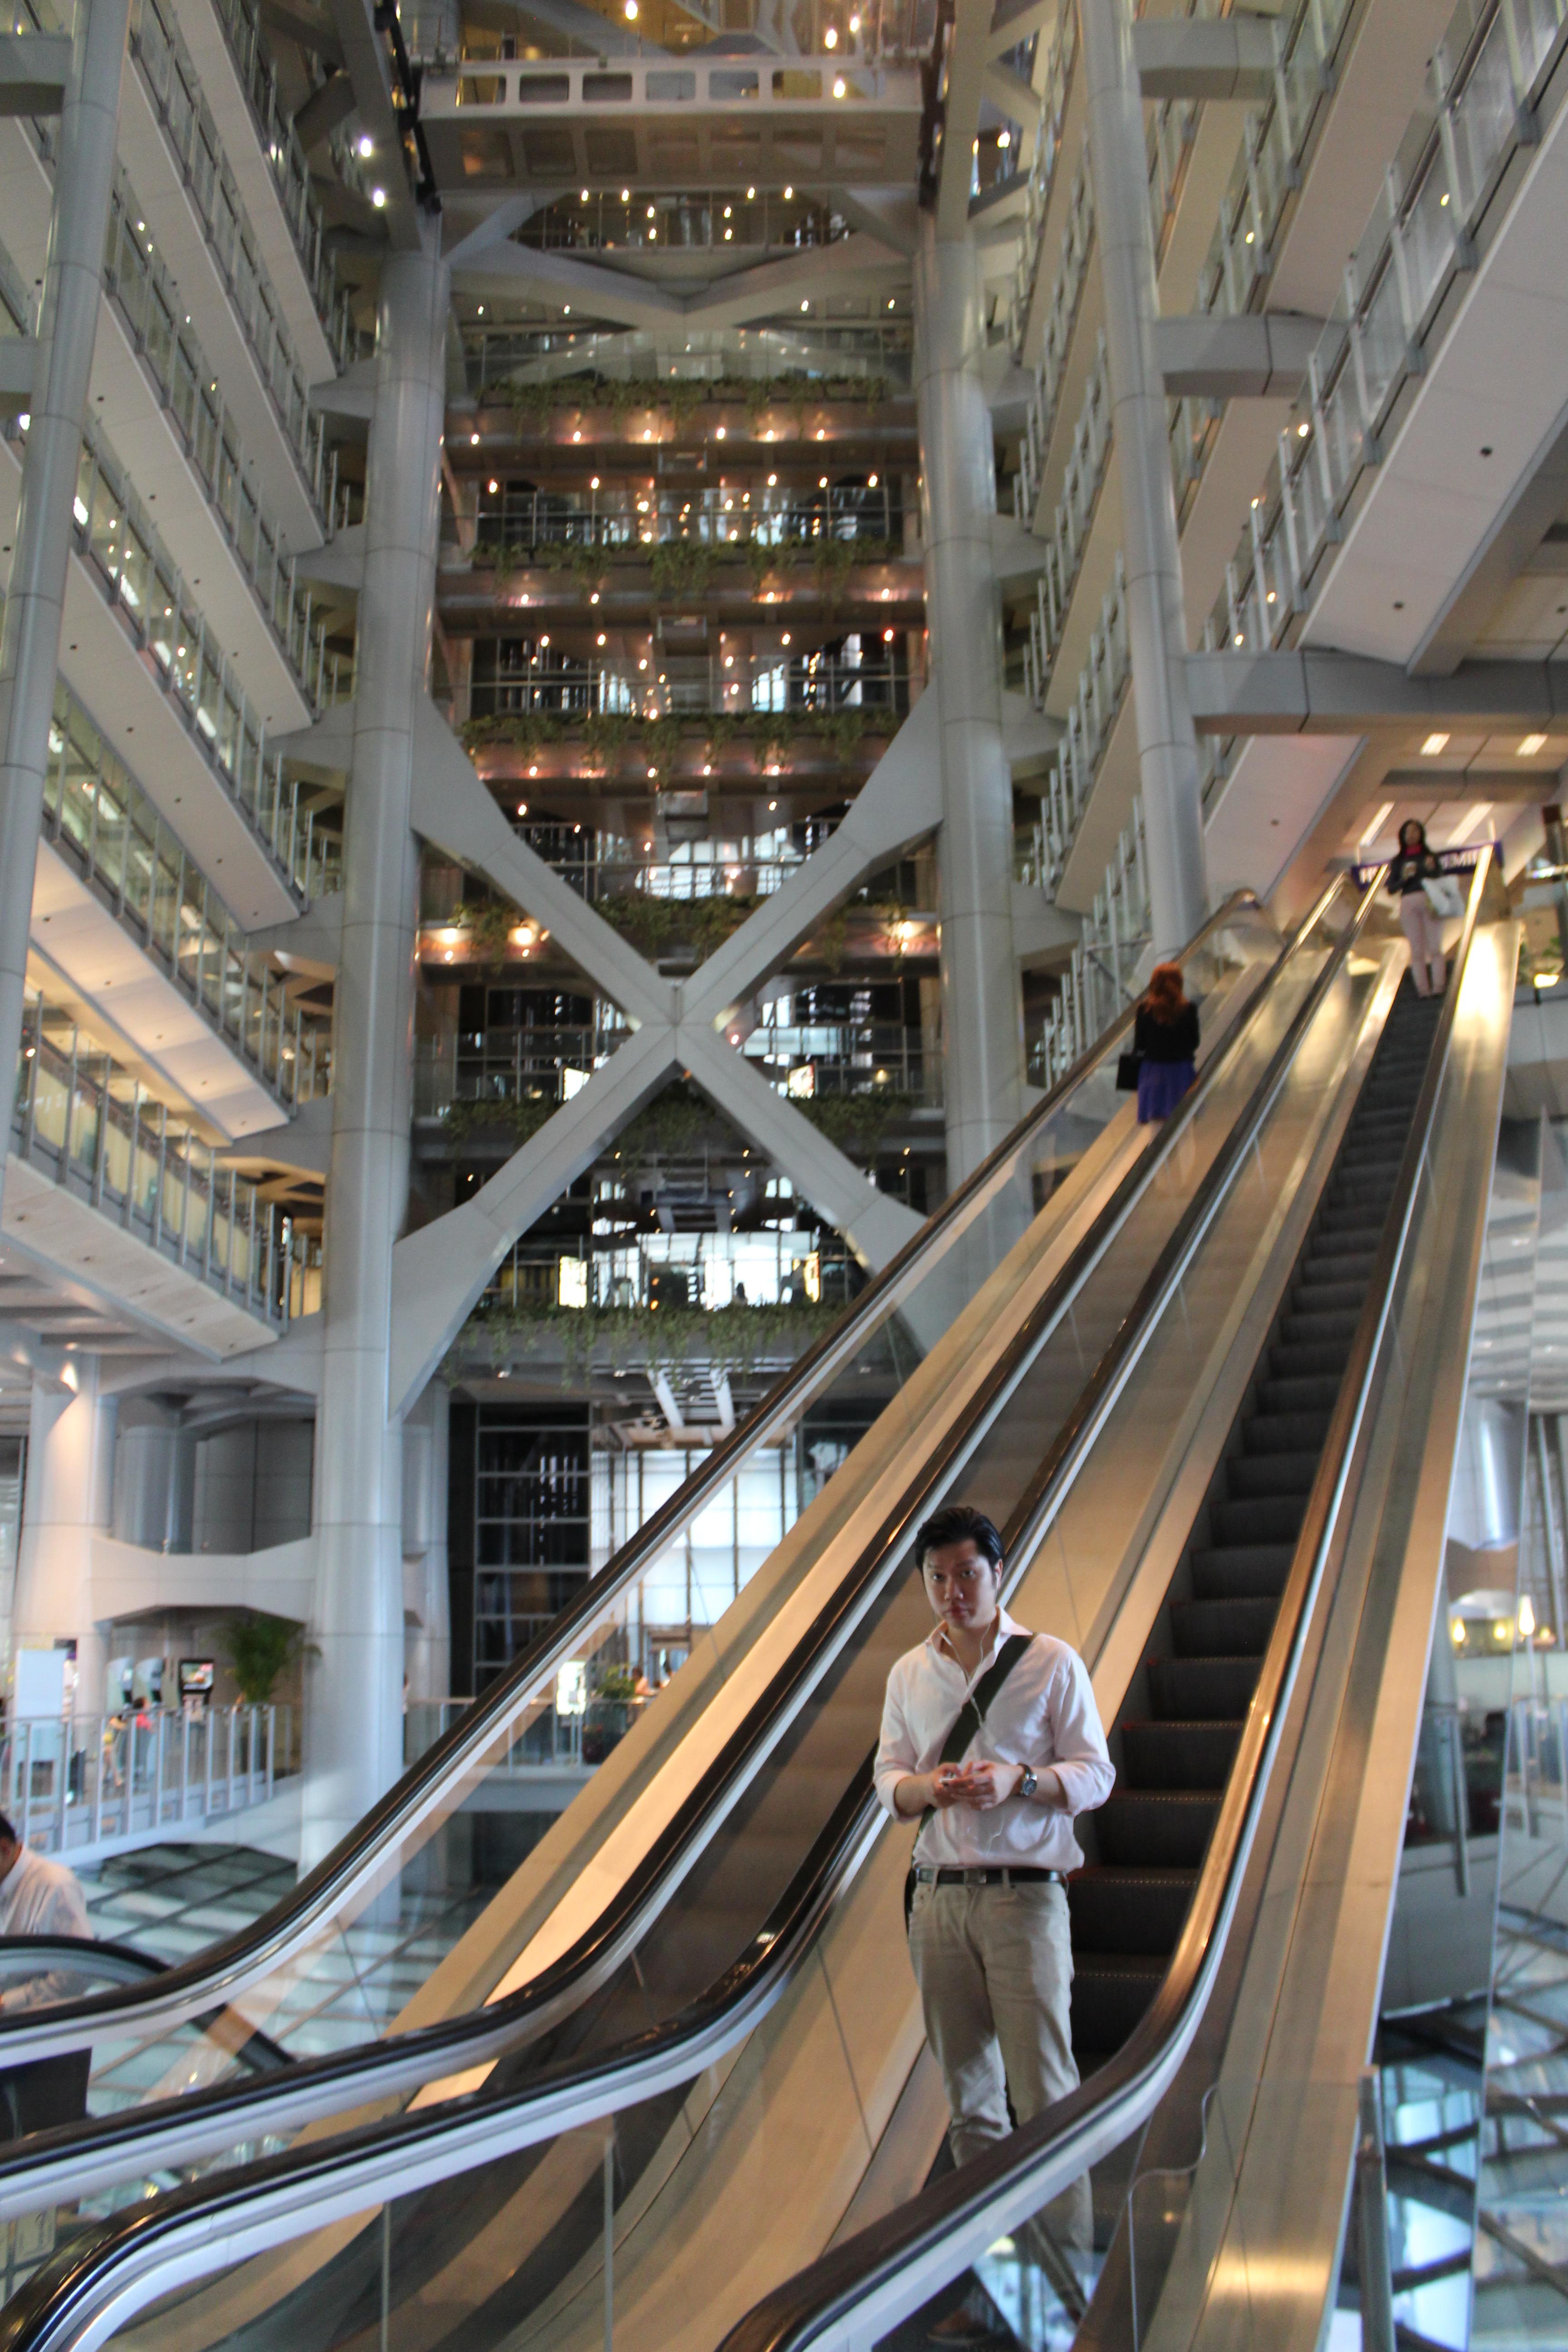 Hsbc Hong Kong Travel Insurance Claim Form